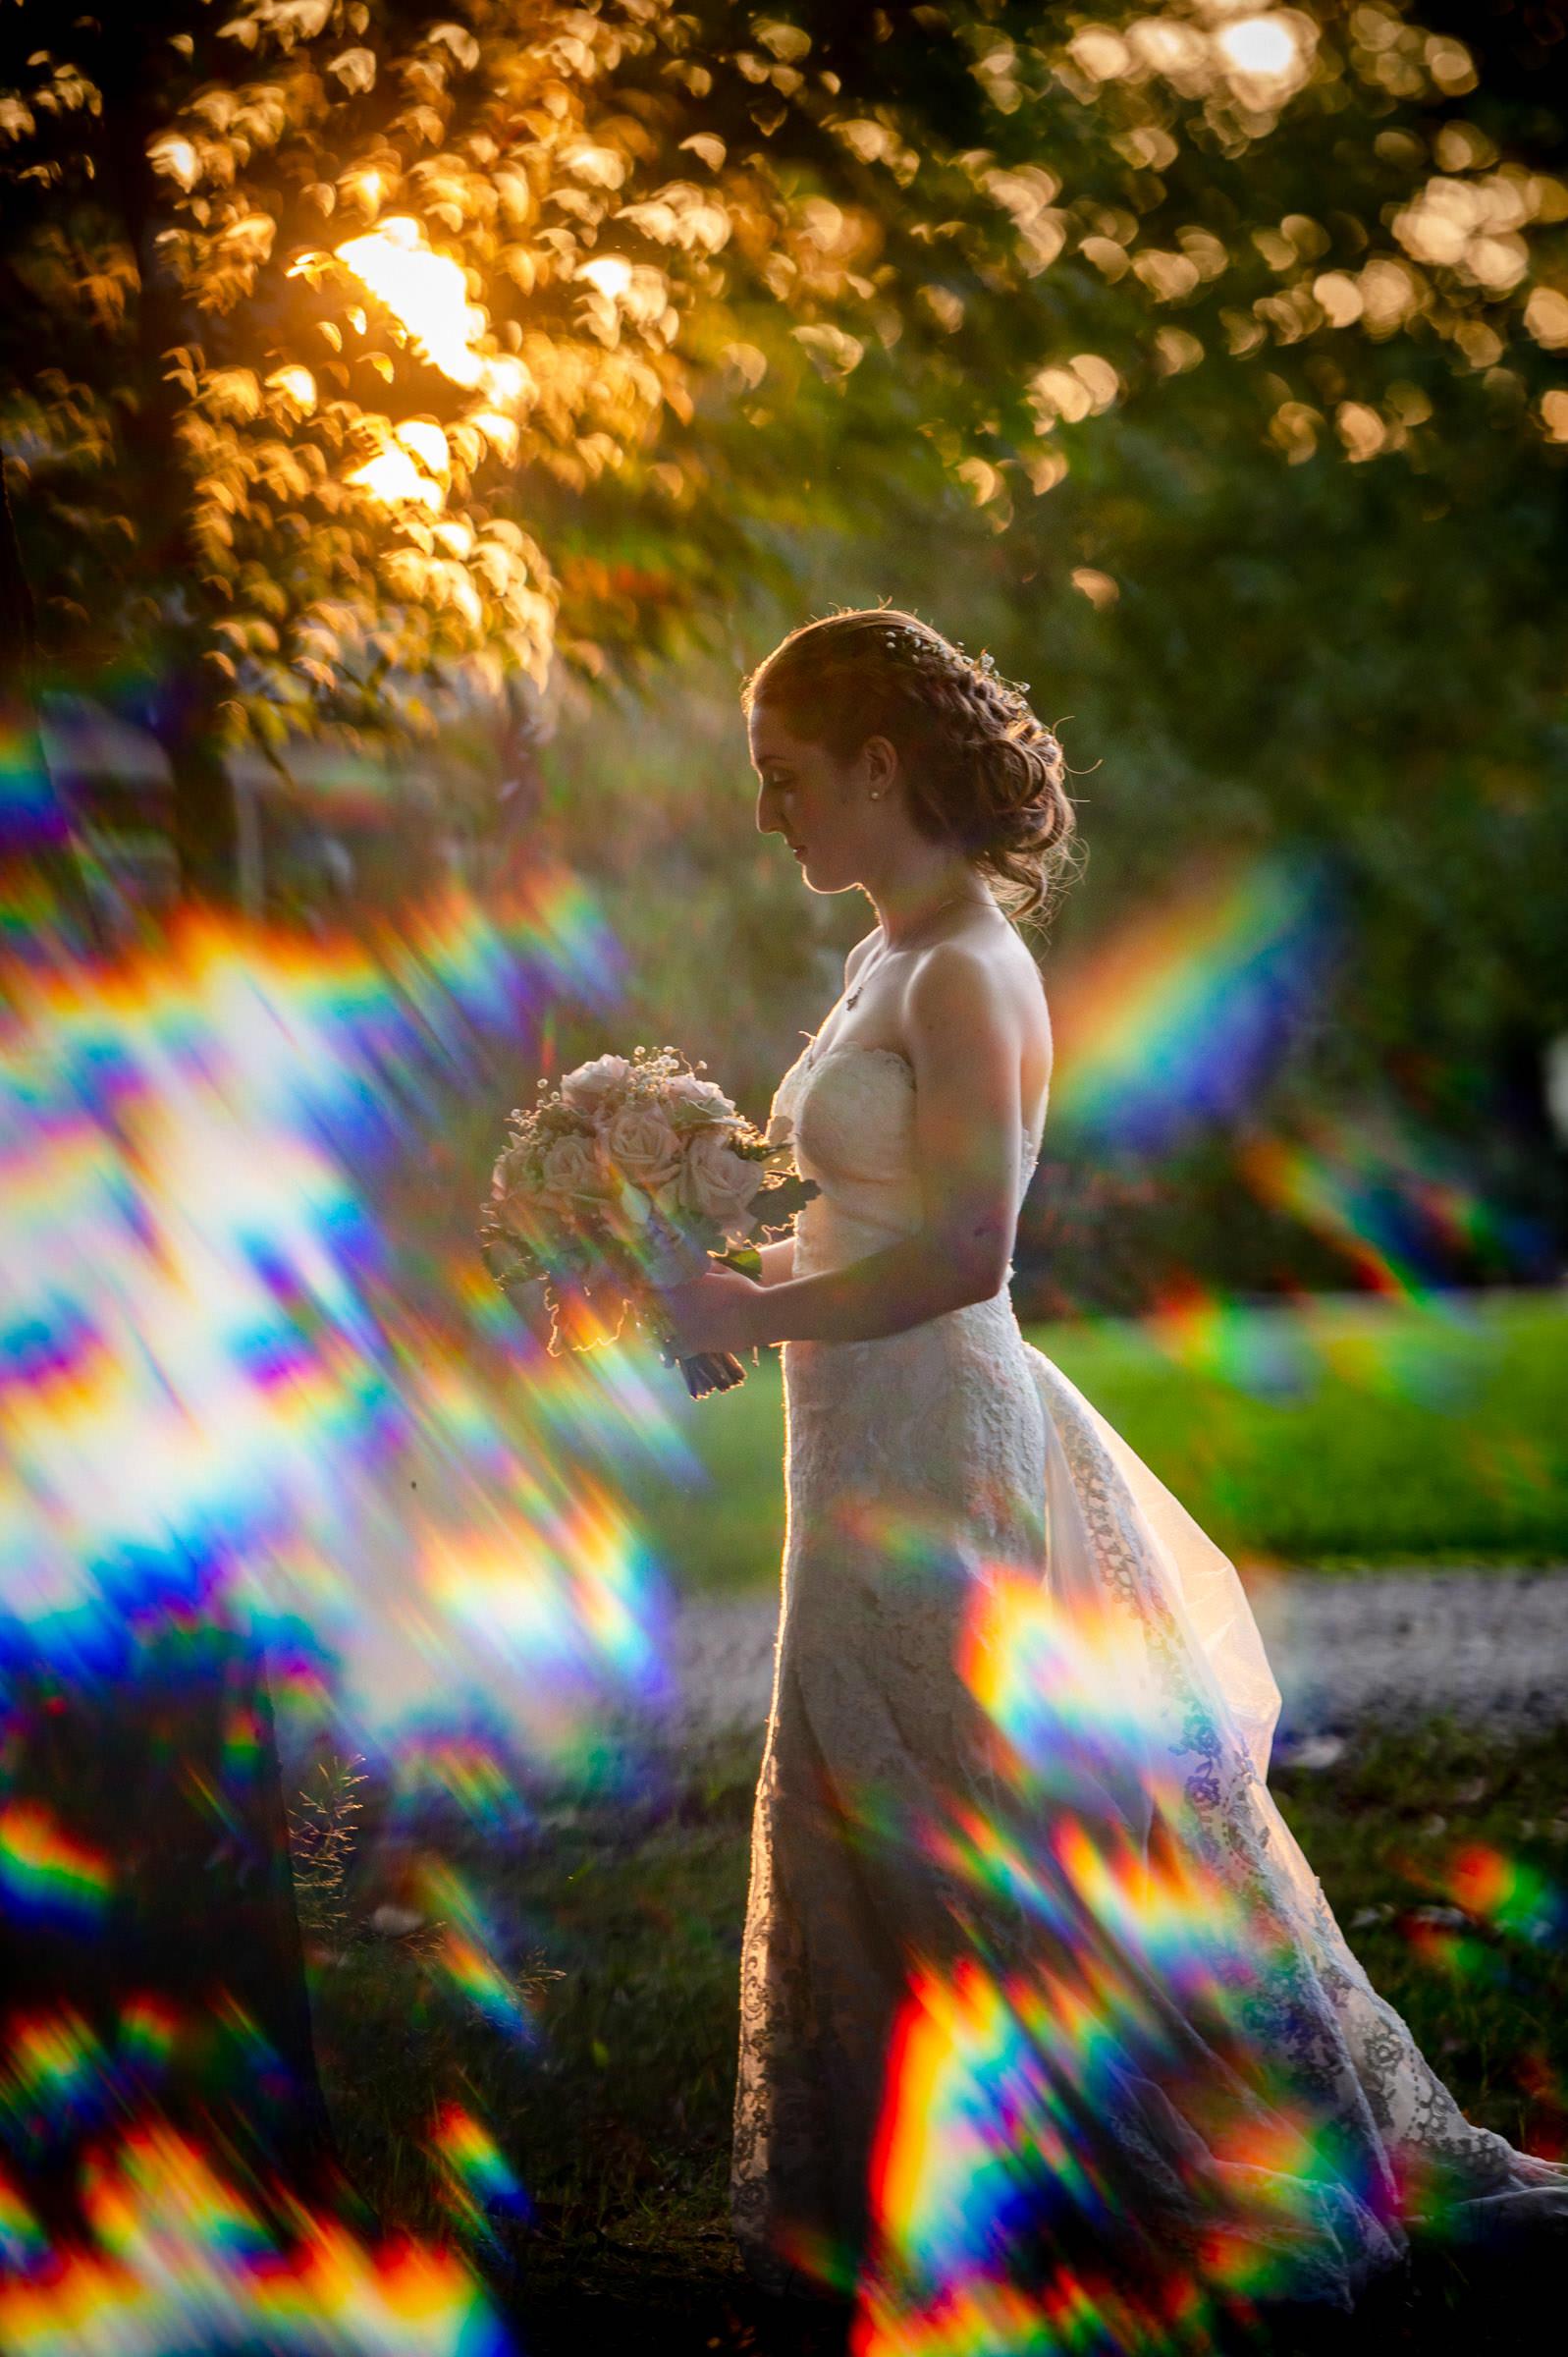 prism-light-on-bride-under-maple-tree-randall-garnick-photography